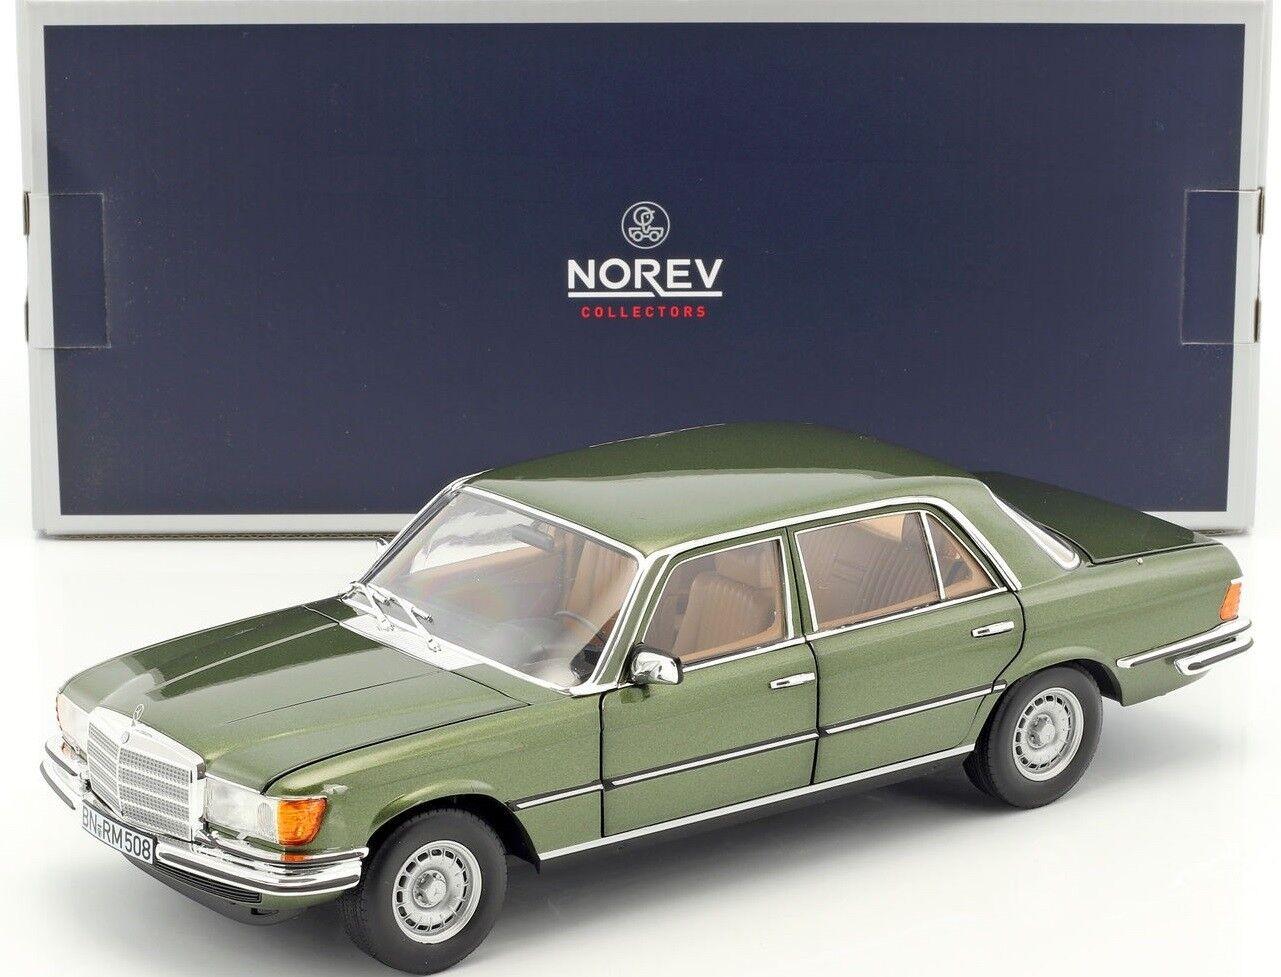 NOREV183455 - Voiture berline MERCEDES 450 SEL 6.9 couleur vert métallique de 19